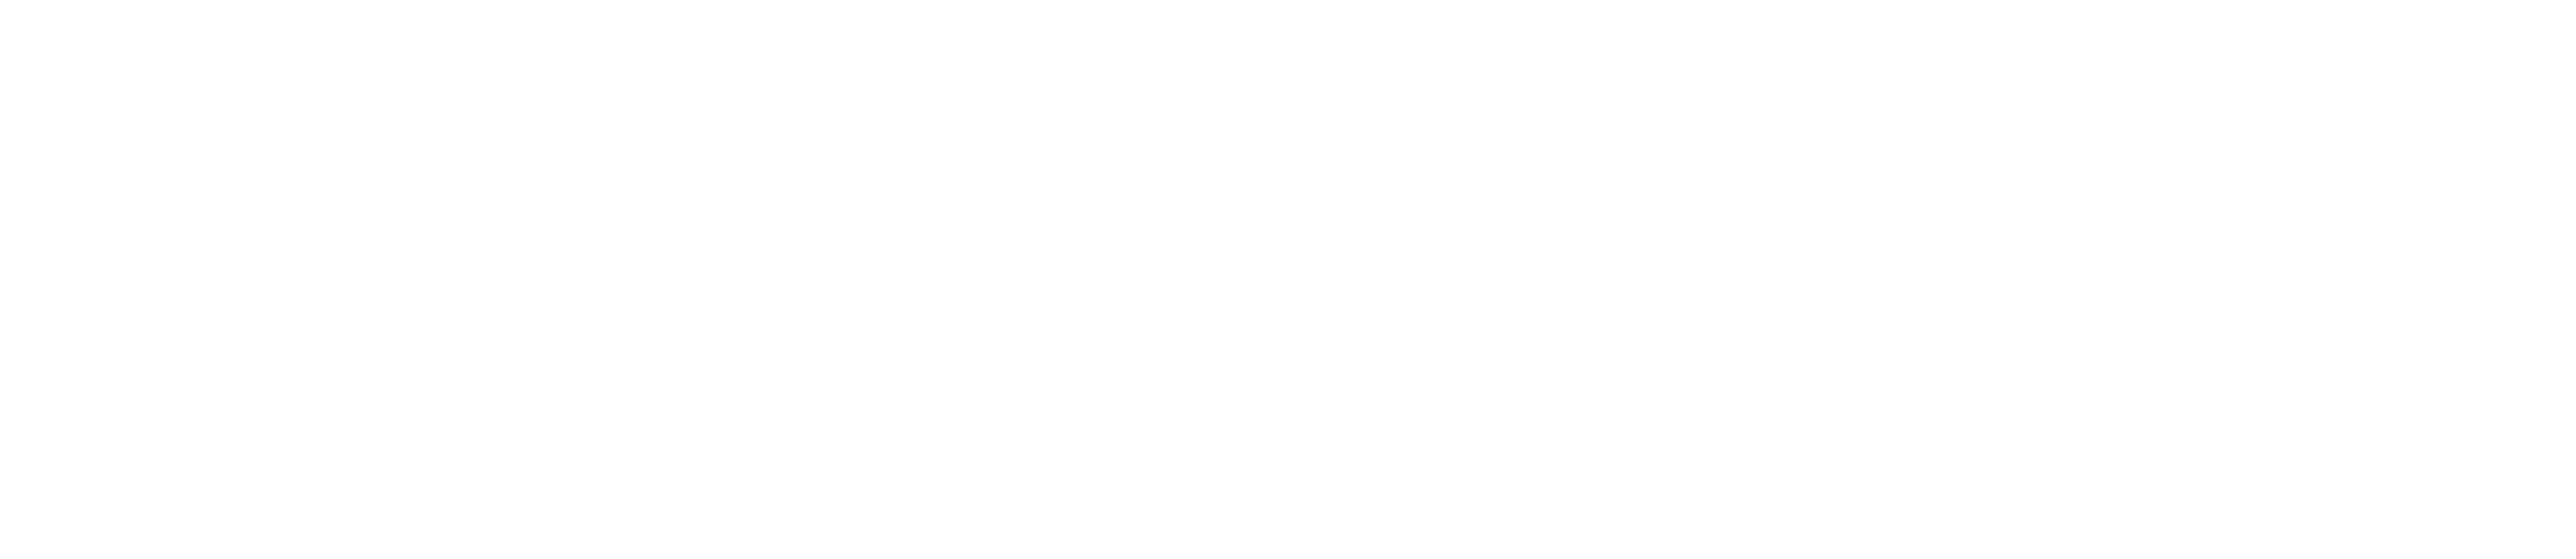 BLTV GmbH